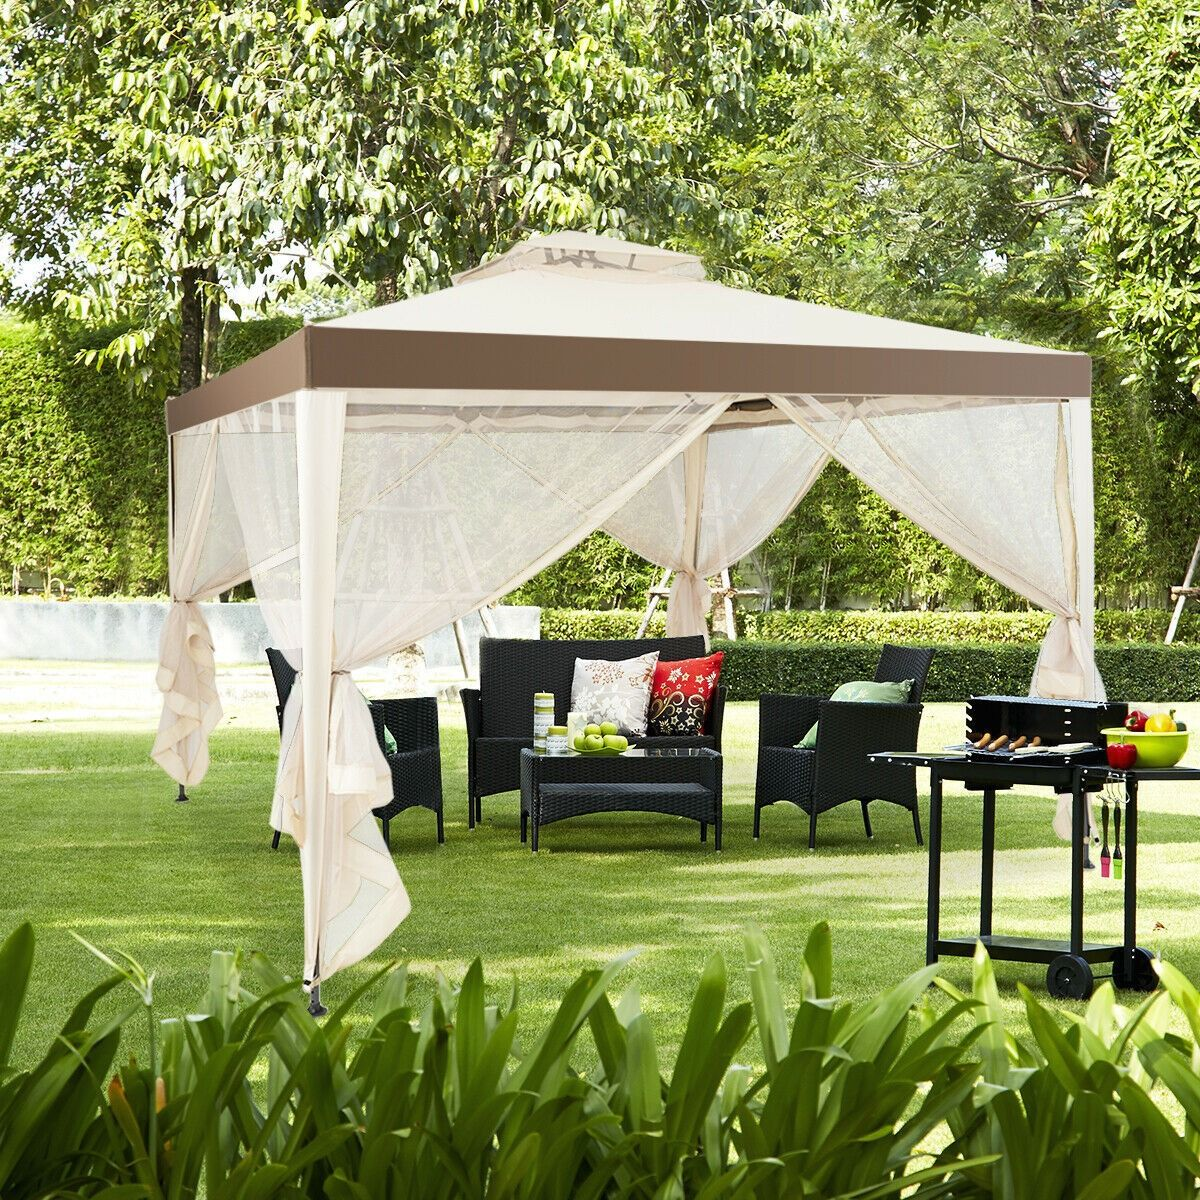 Canopy Gazebo Tent Shelter Garden Lawn Patio With Mosquito Netting Patio Gazebo Gazebo Tent Gazebo